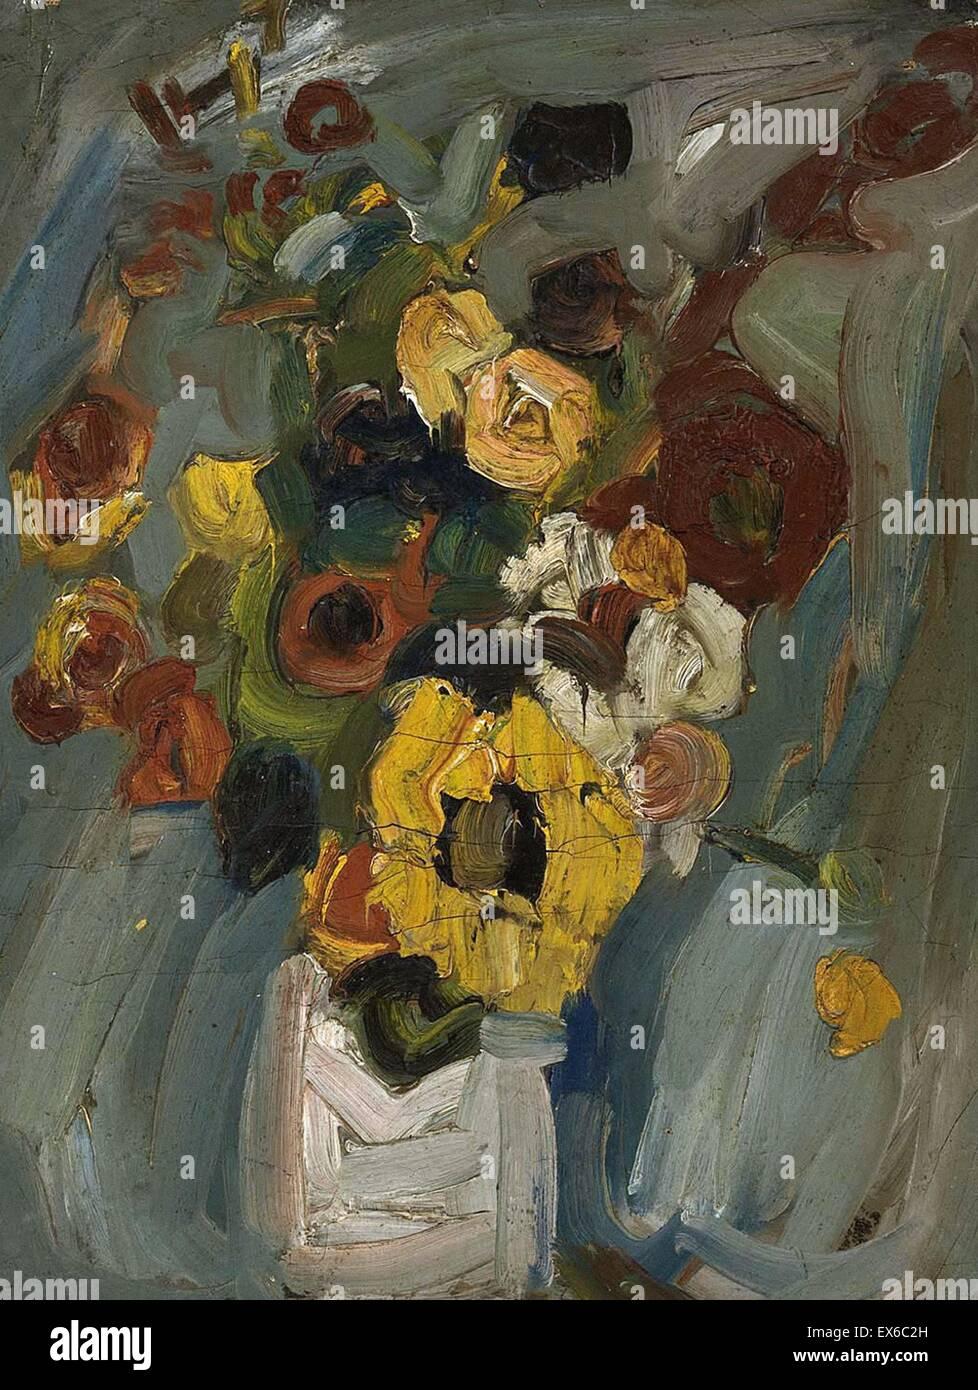 William H. Johnson Still Life - Fleurs Photo Stock